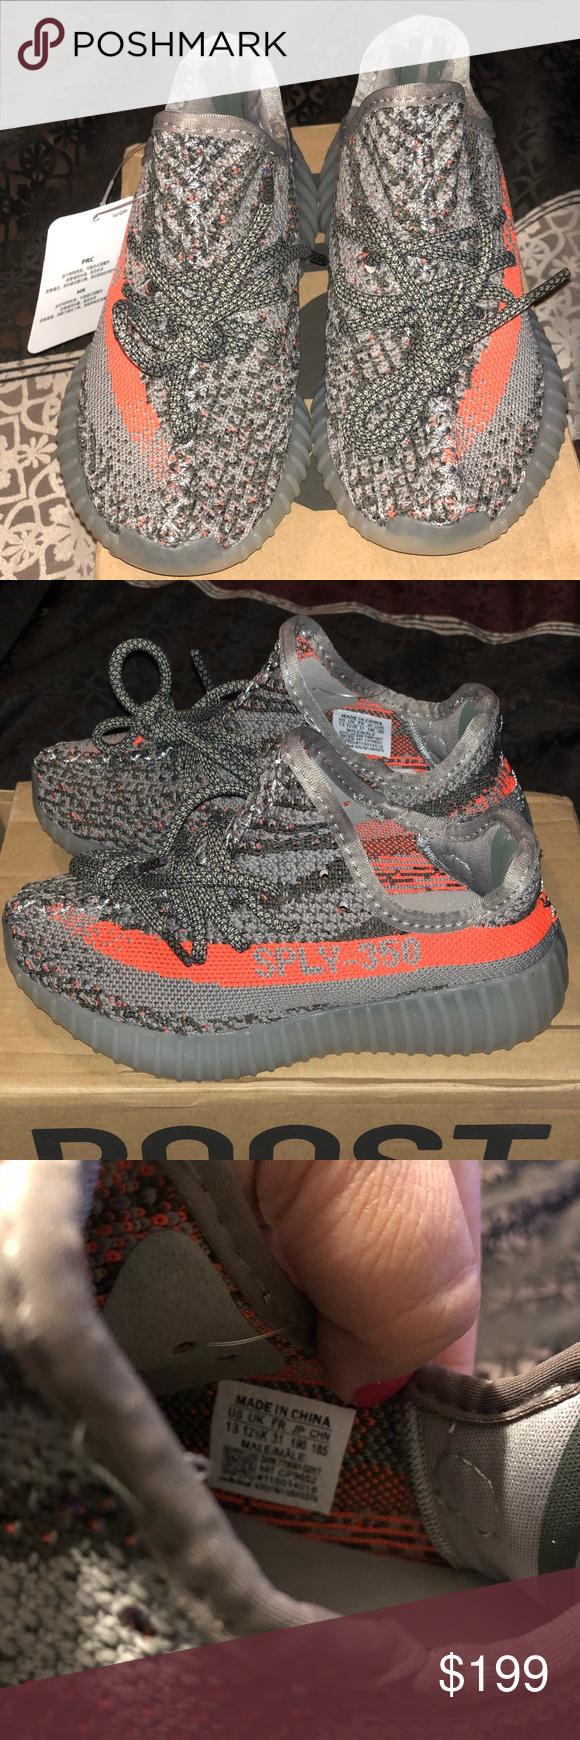 9ced476da4dc2 Yeezy kids boost 350 V2 Beluga 2.0 Brand New kids size 13 Yeezy boost 350  V2 Grey Orange. Will ship next day. Yeezy Shoes Sneakers